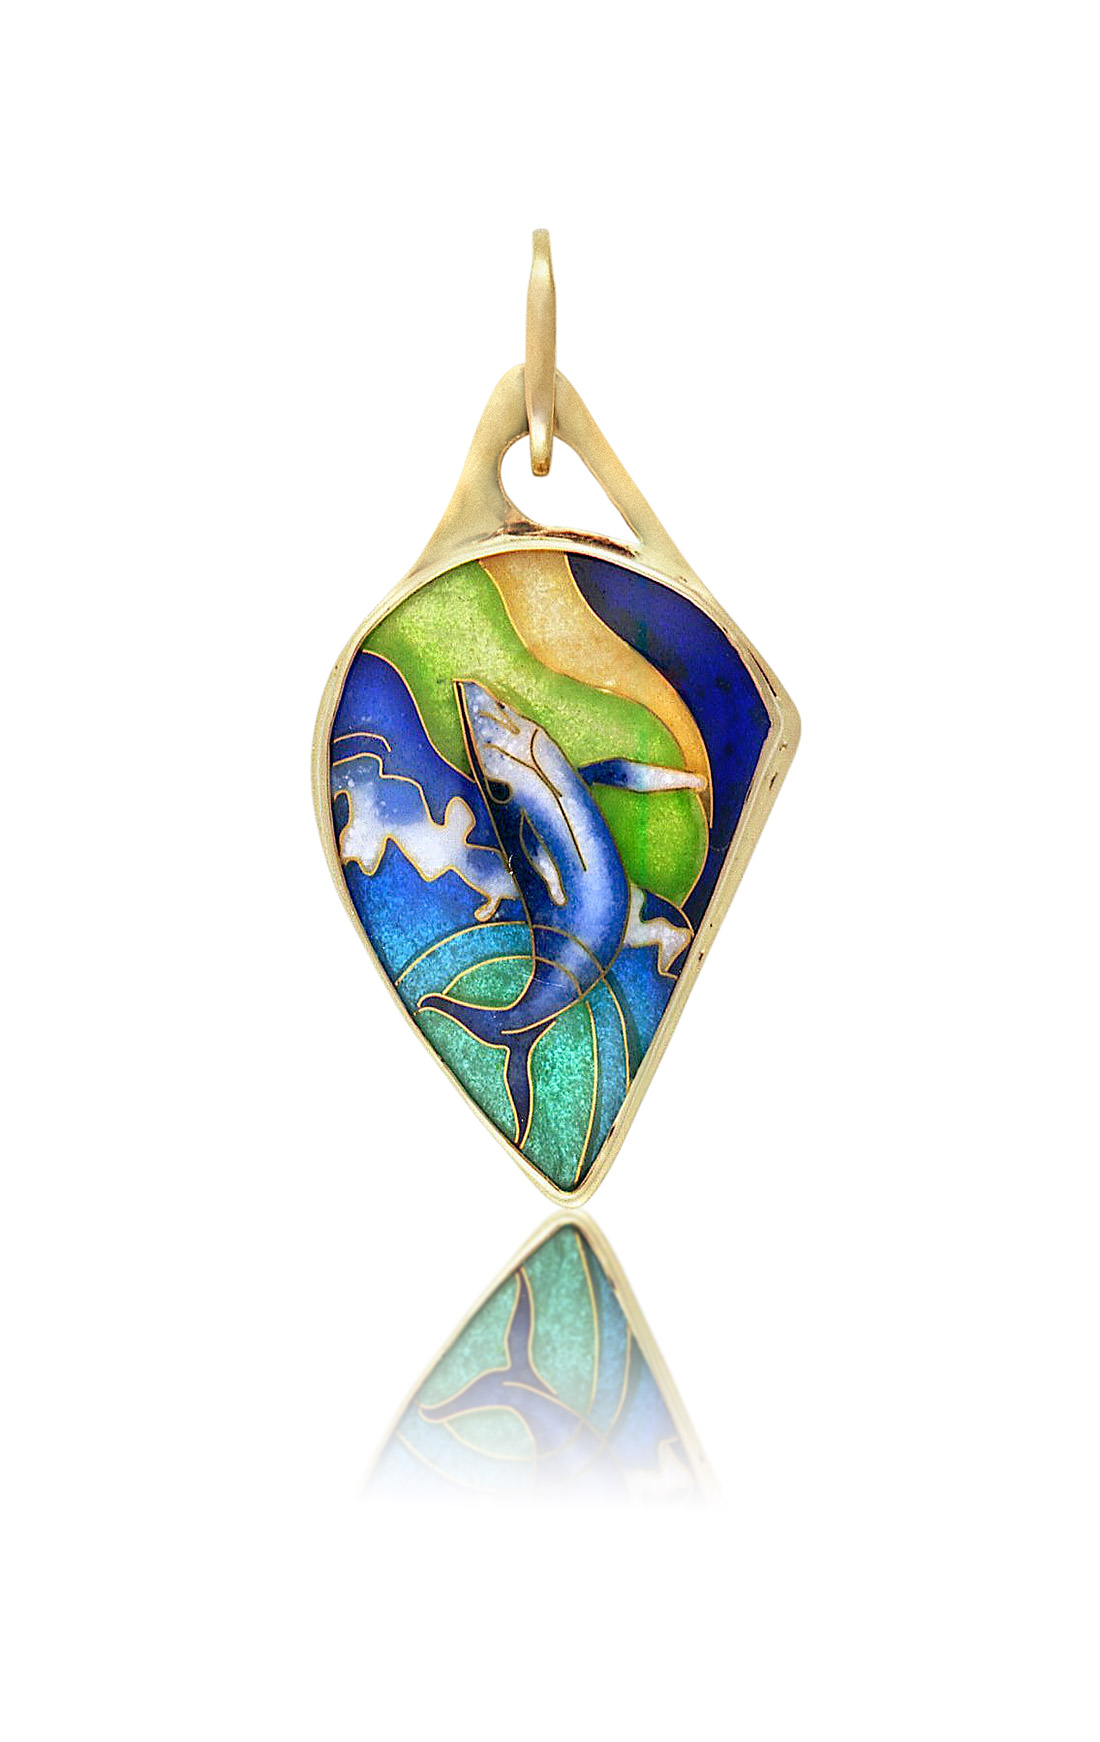 Breaching Whale   Cloisonne jewelry   Enamel jewelry   Unique jewelry designs